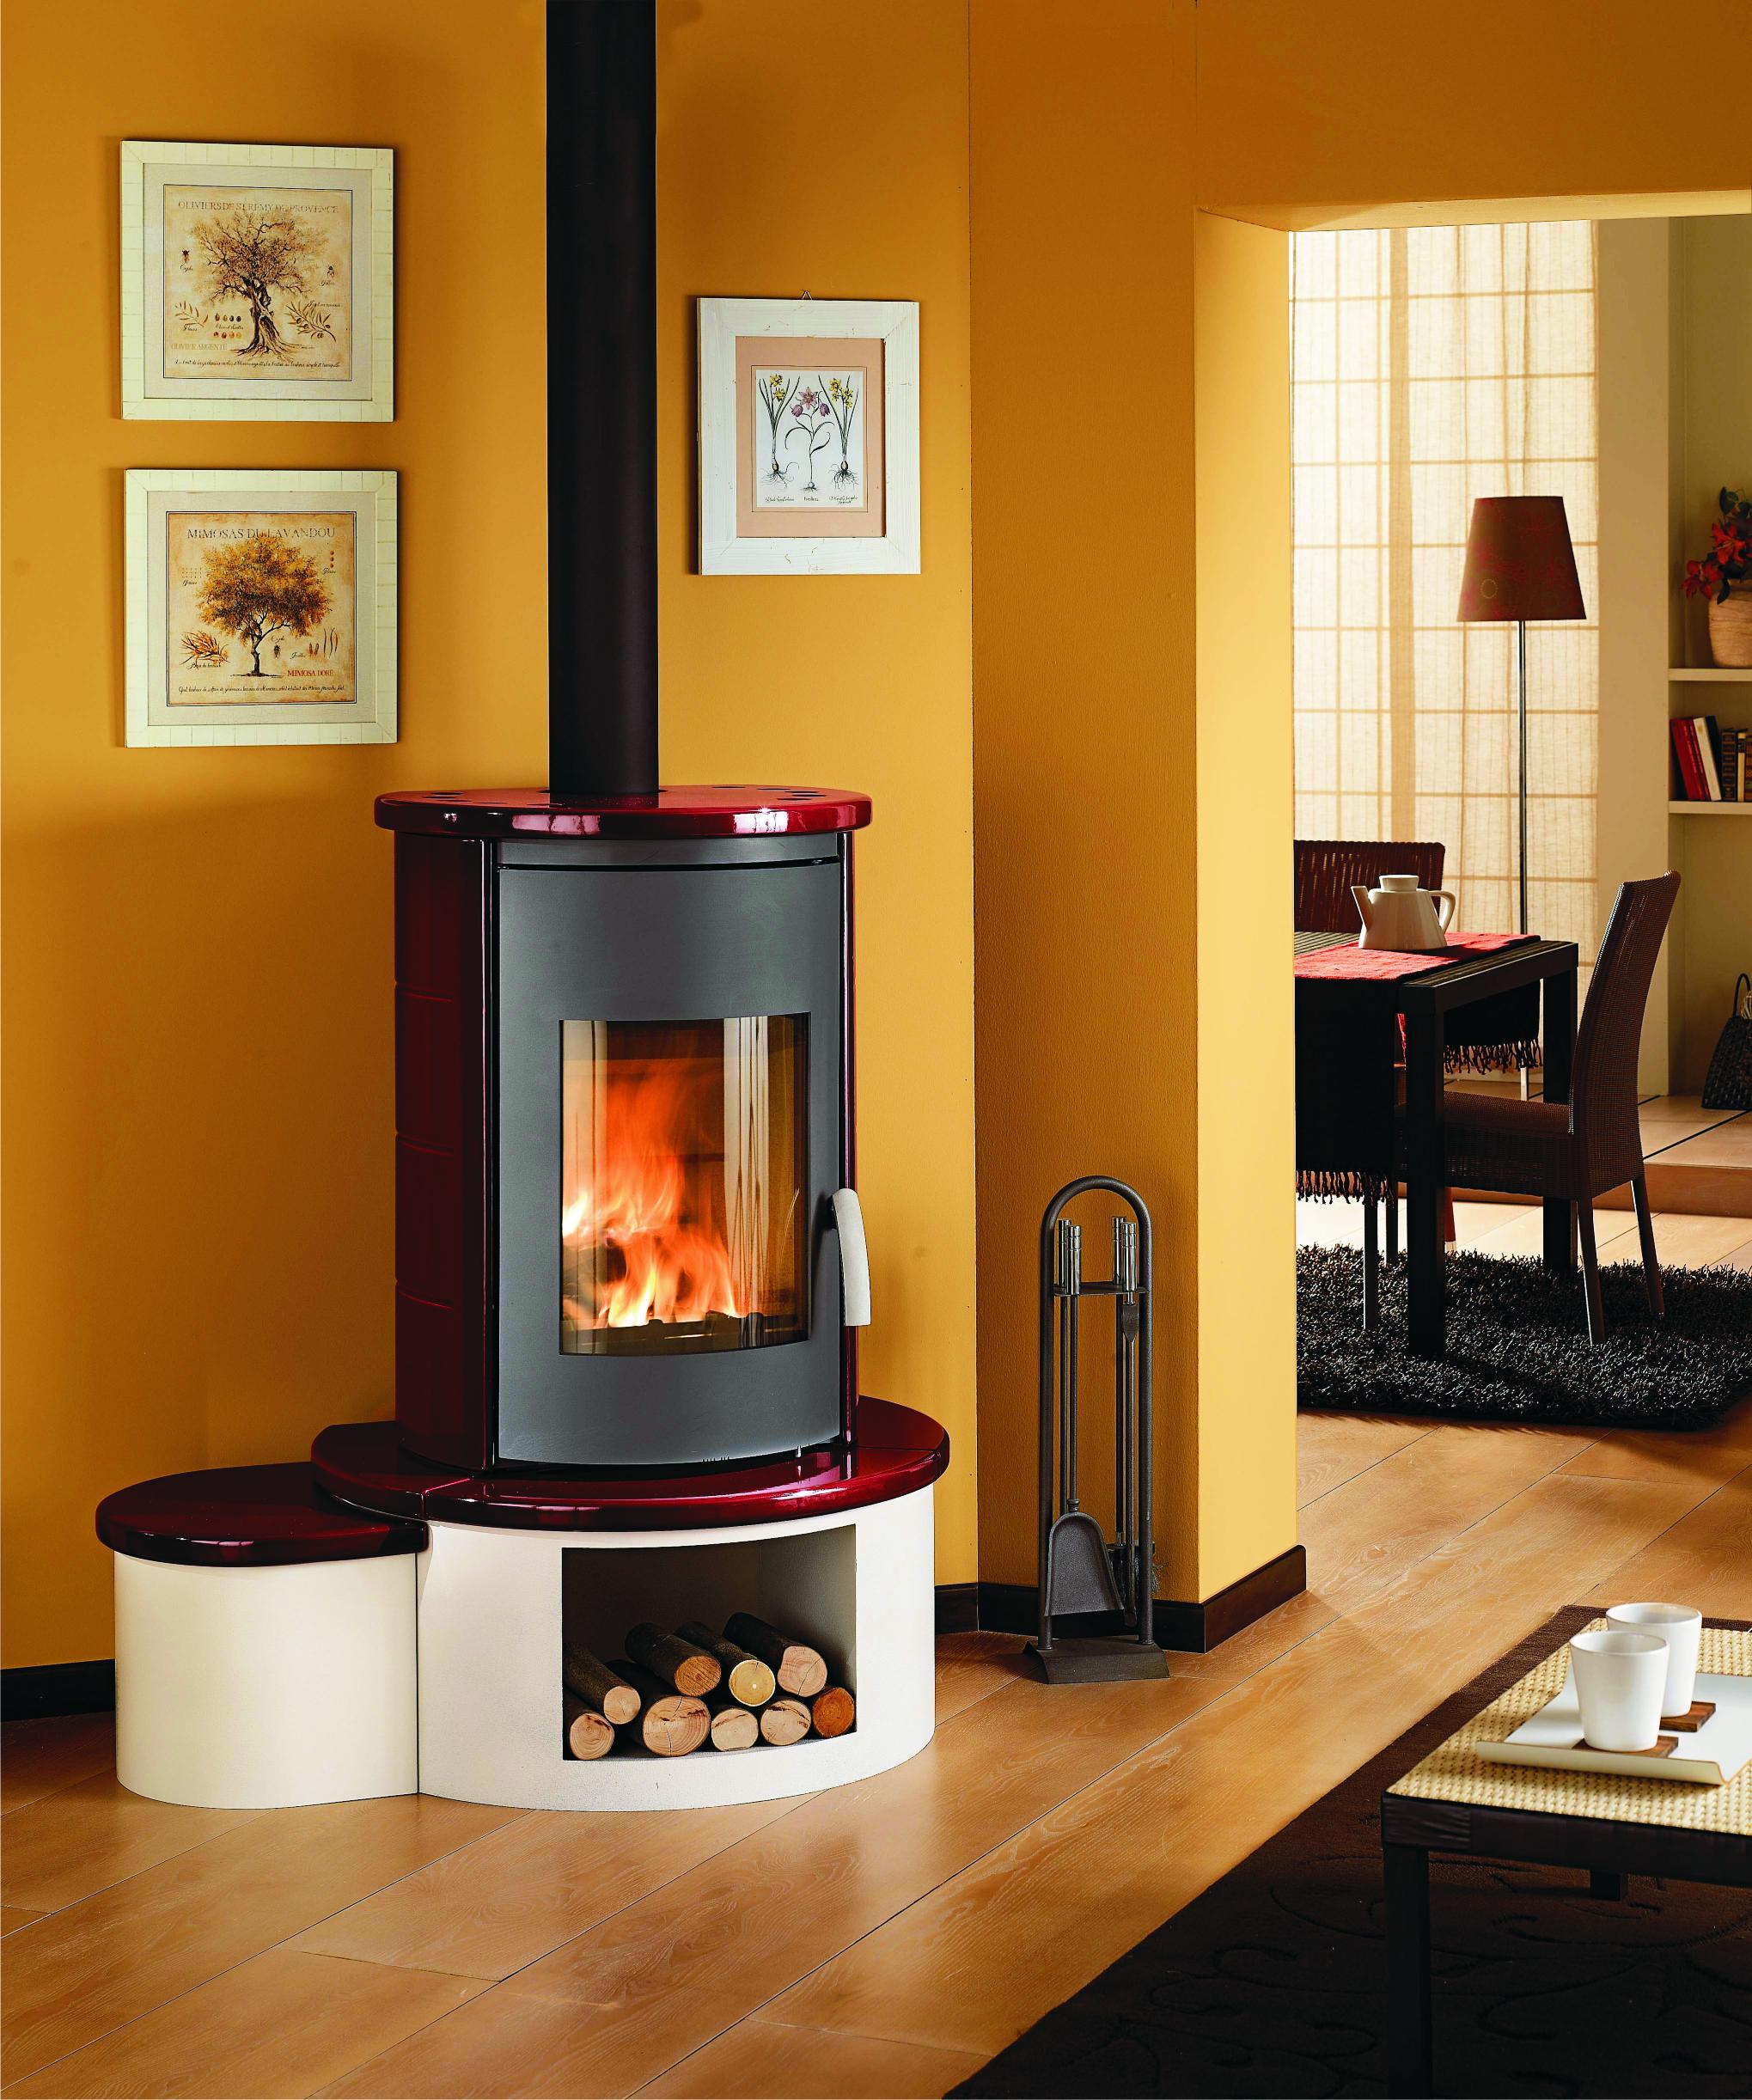 kaminofen wamsler kf 111 rona keramik bordeaux 6 kw bei. Black Bedroom Furniture Sets. Home Design Ideas